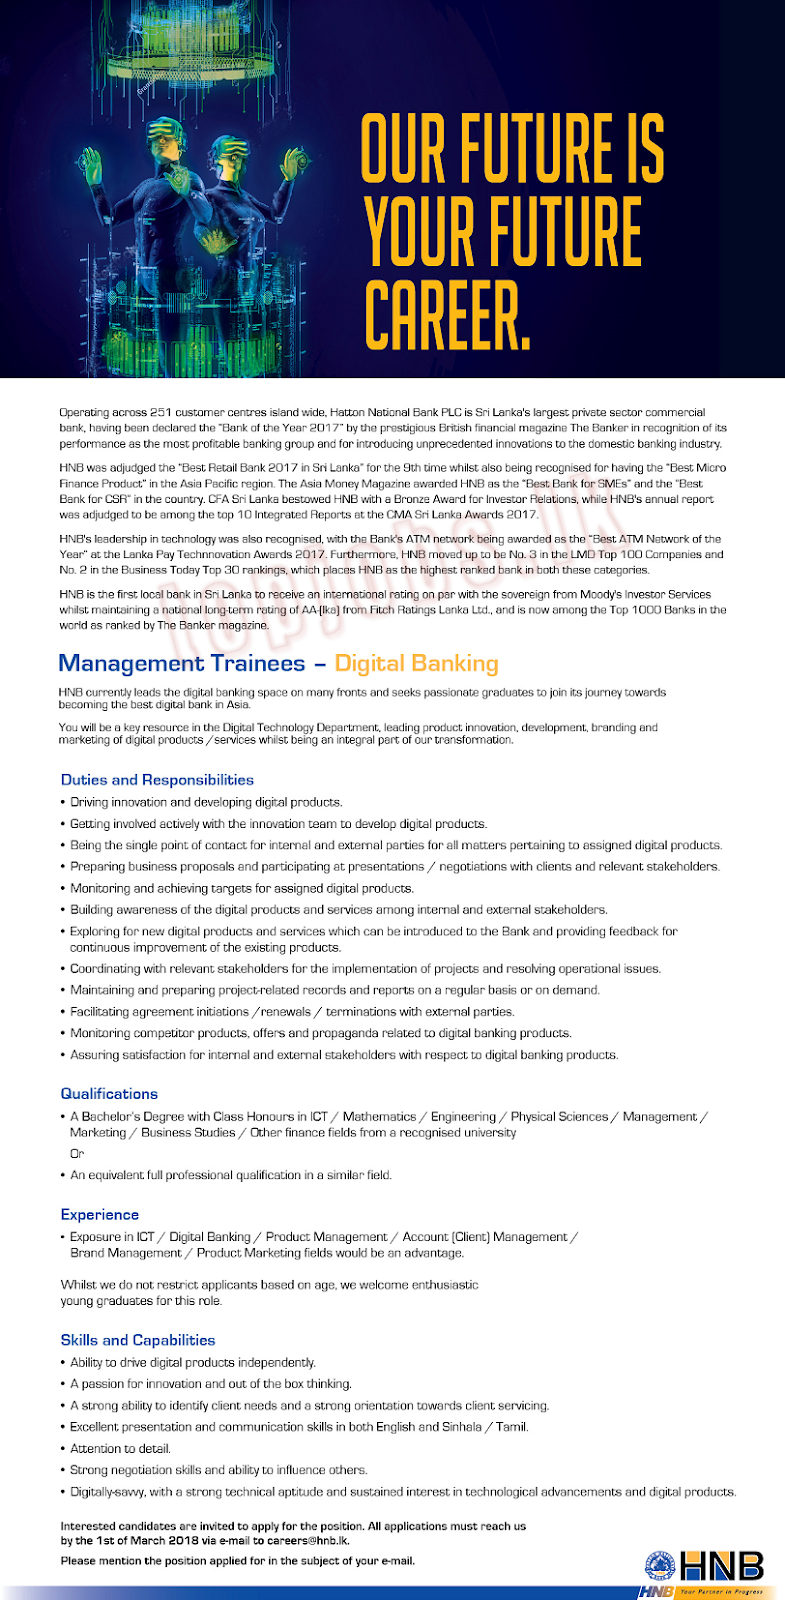 HNB Management Trainees - Digital Banking